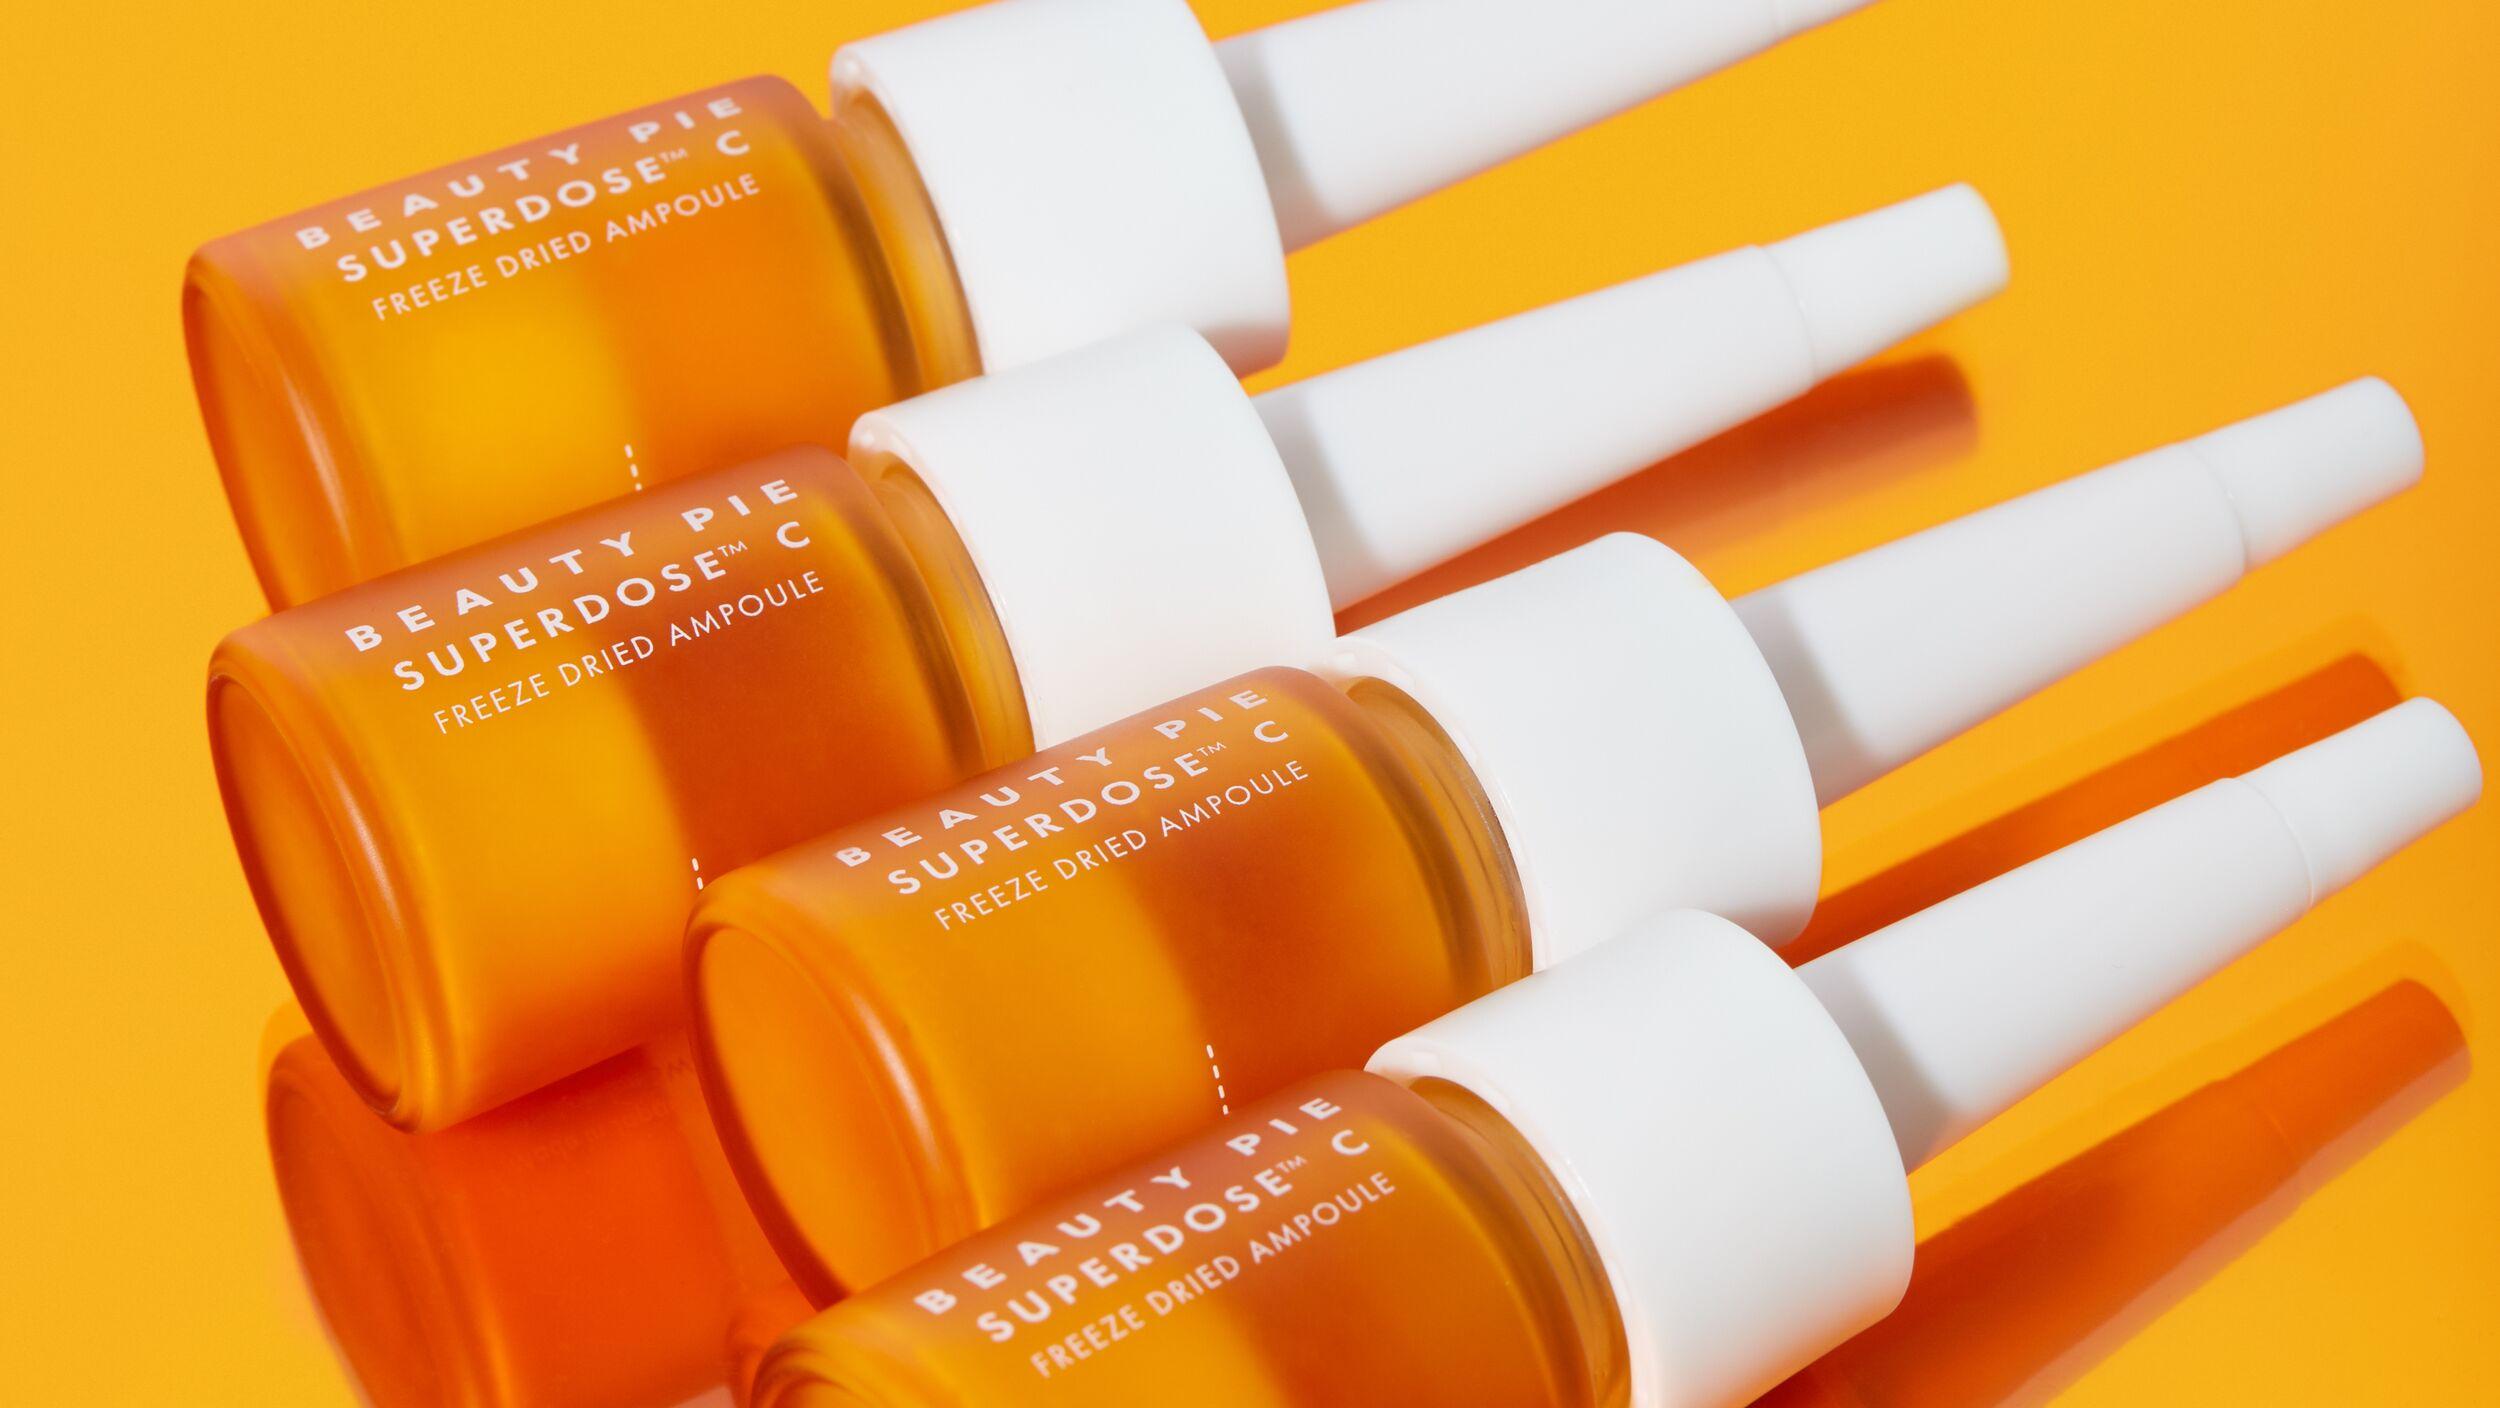 Superdose Vitamin C Freeze Dried Ampoules